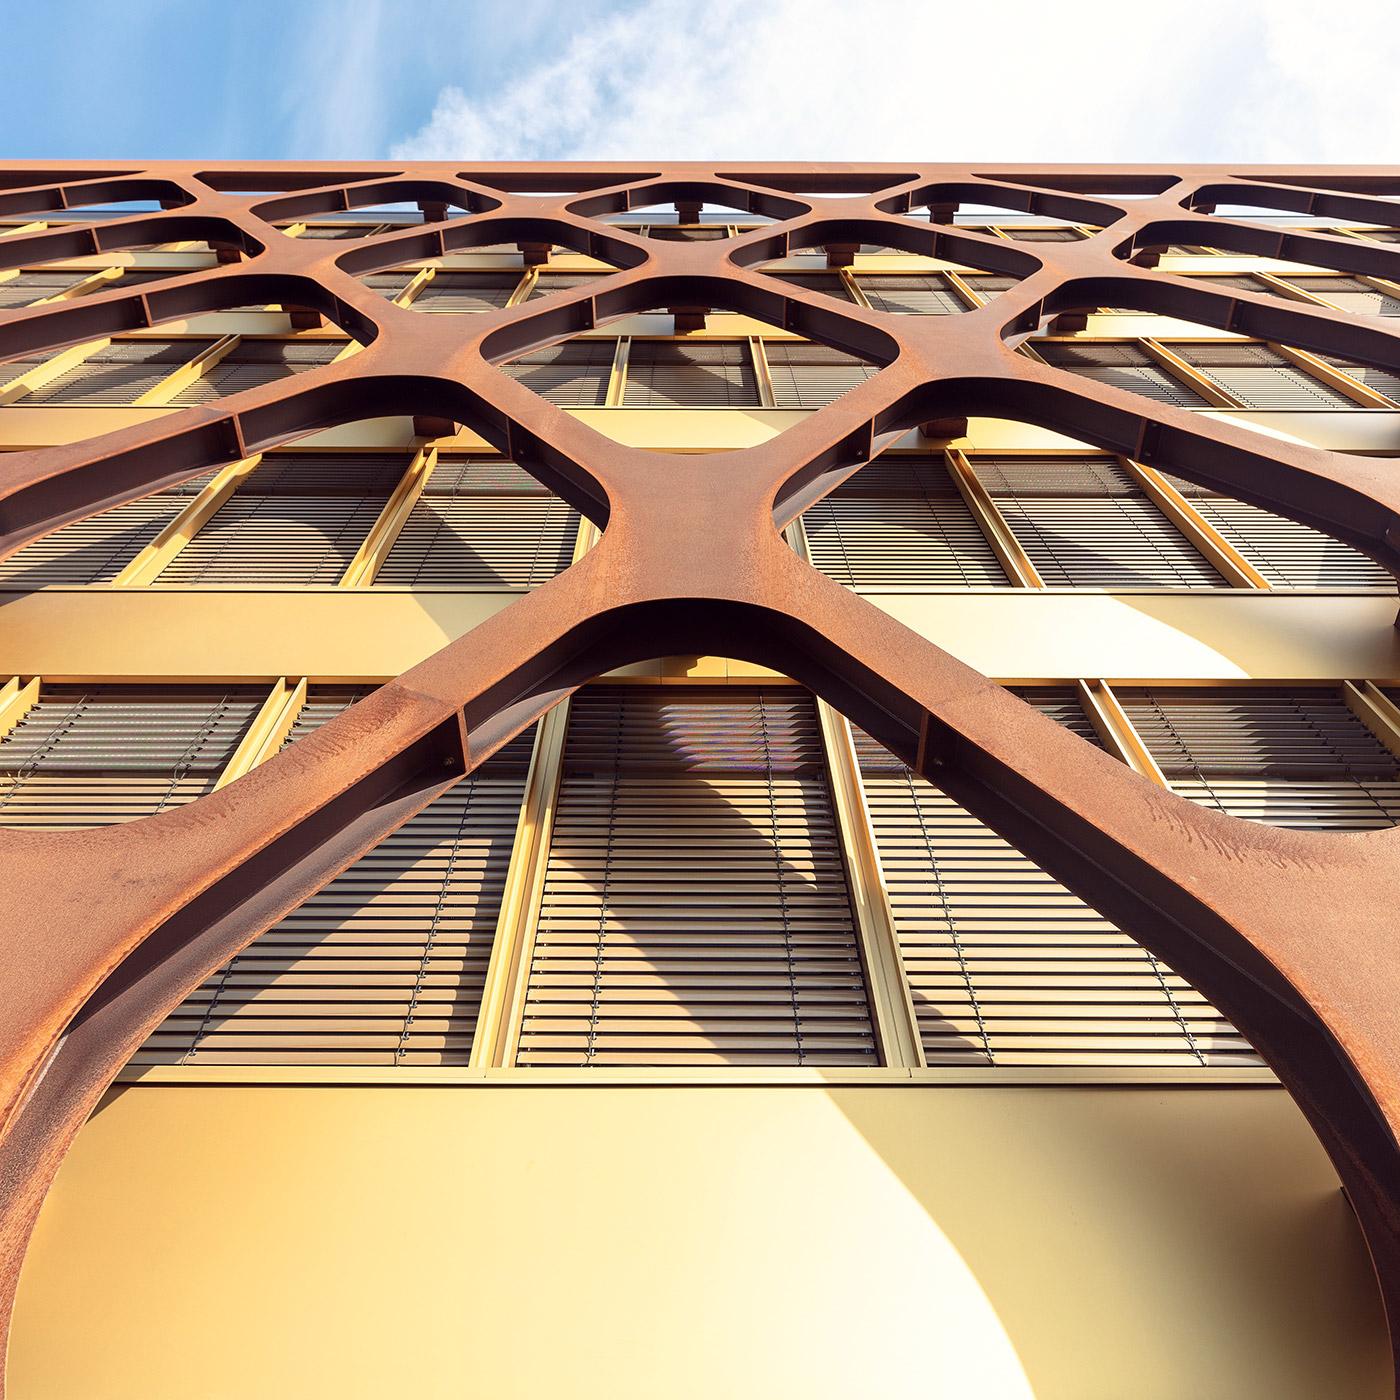 Office Building KPMG . Location: Luxembourg City, Luxembourg . Architect: Valentiny hvp architects